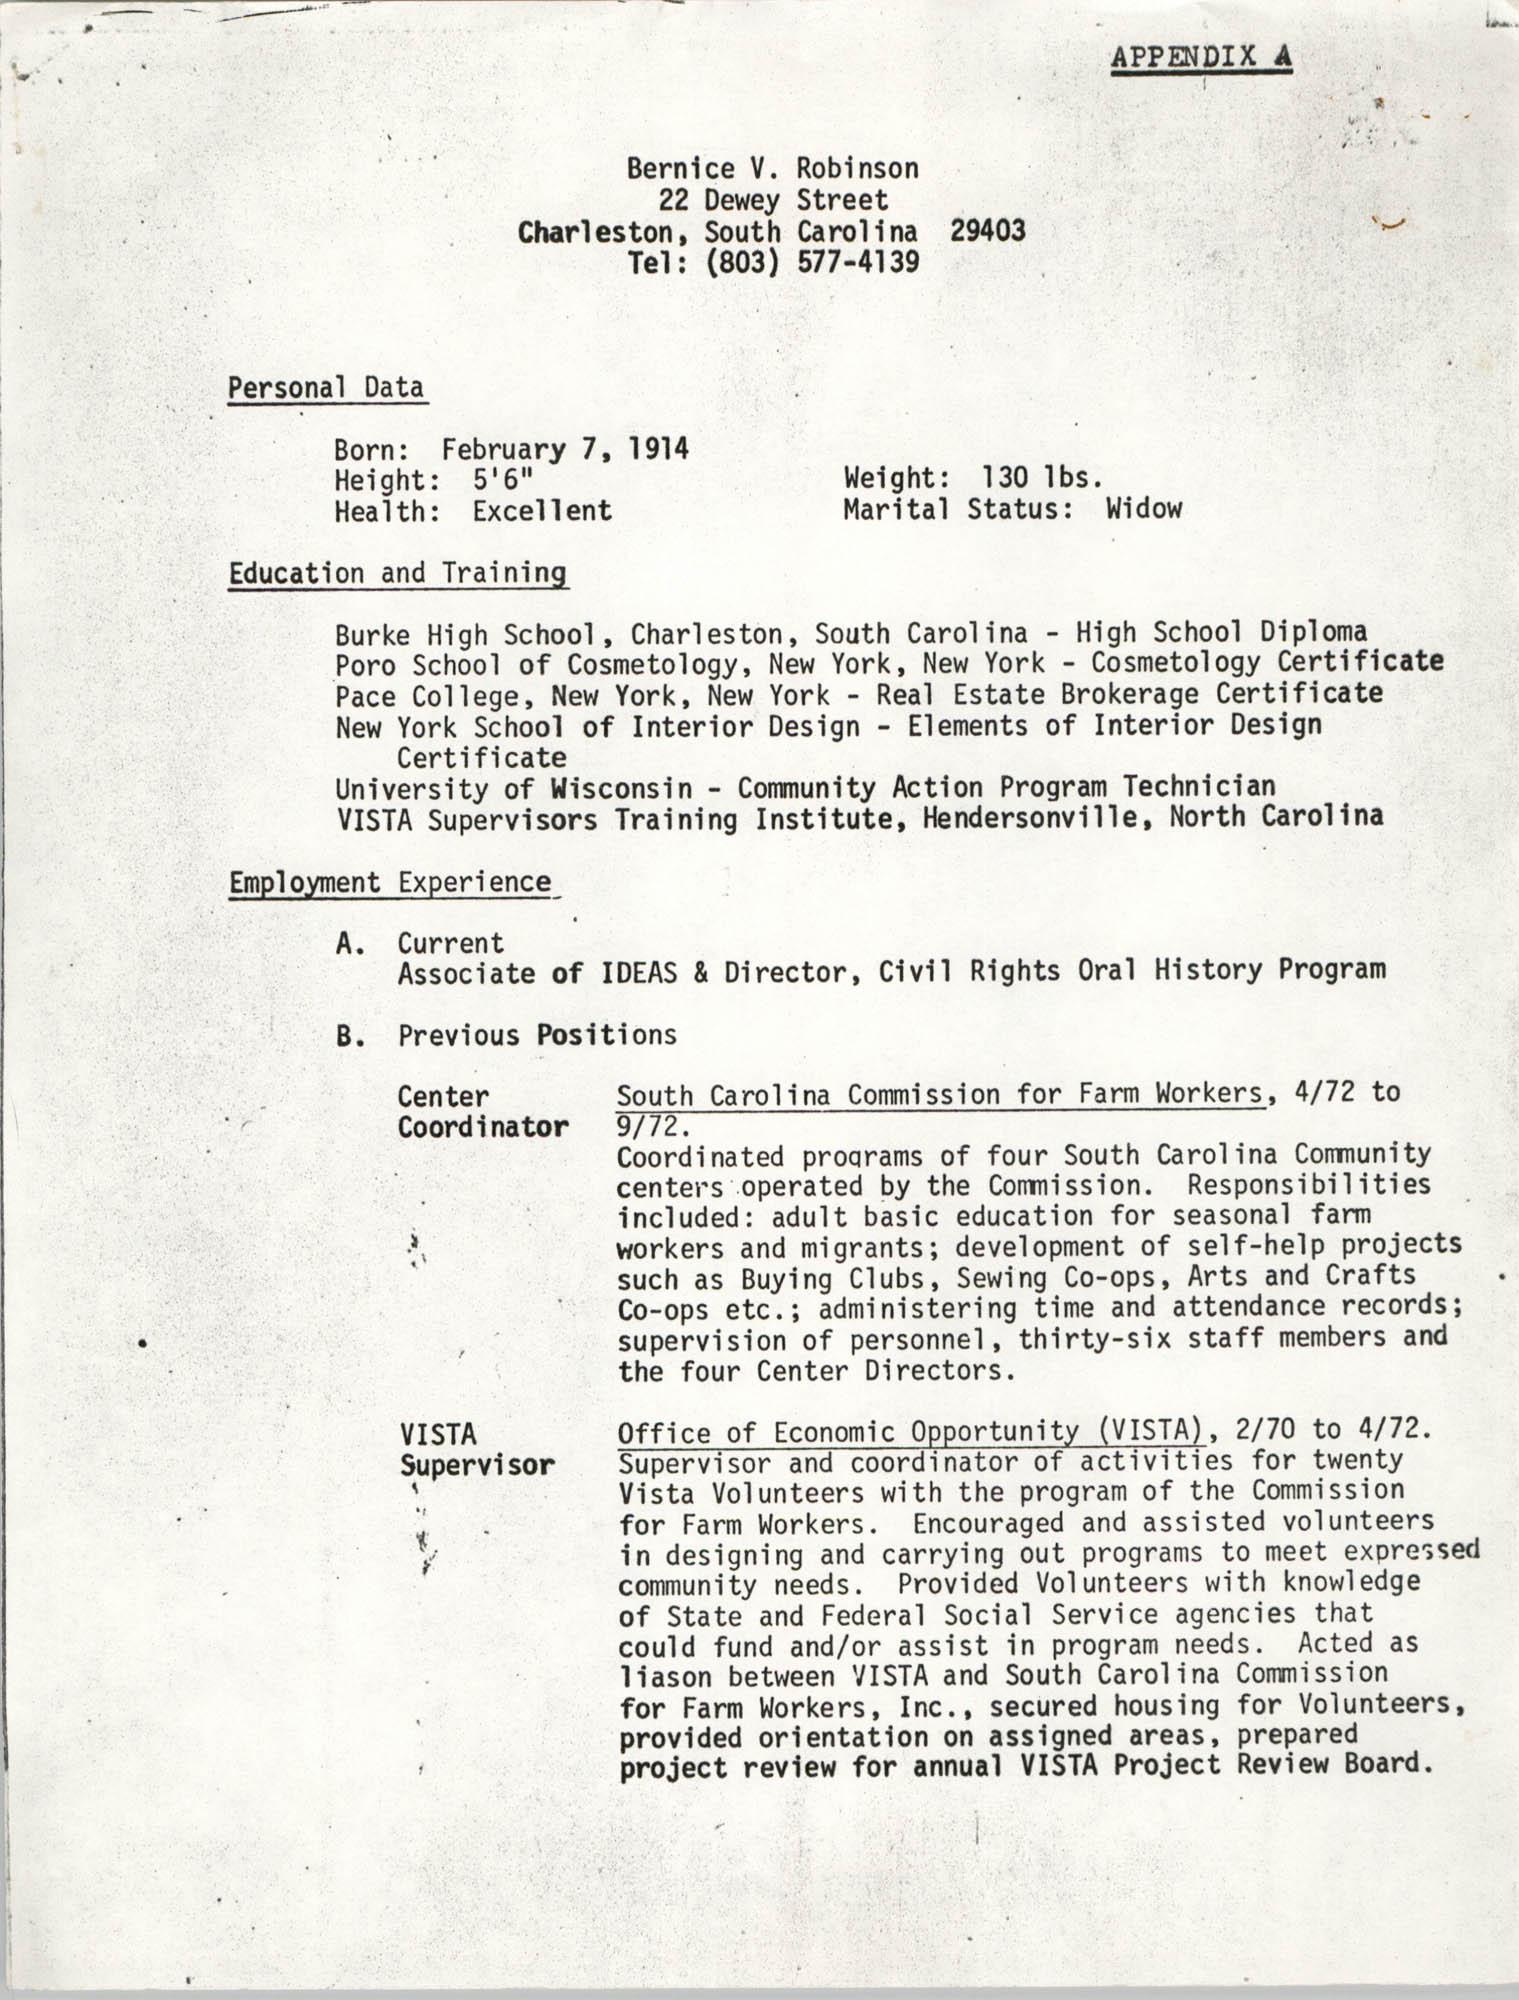 Bernice V. Robinson Resume